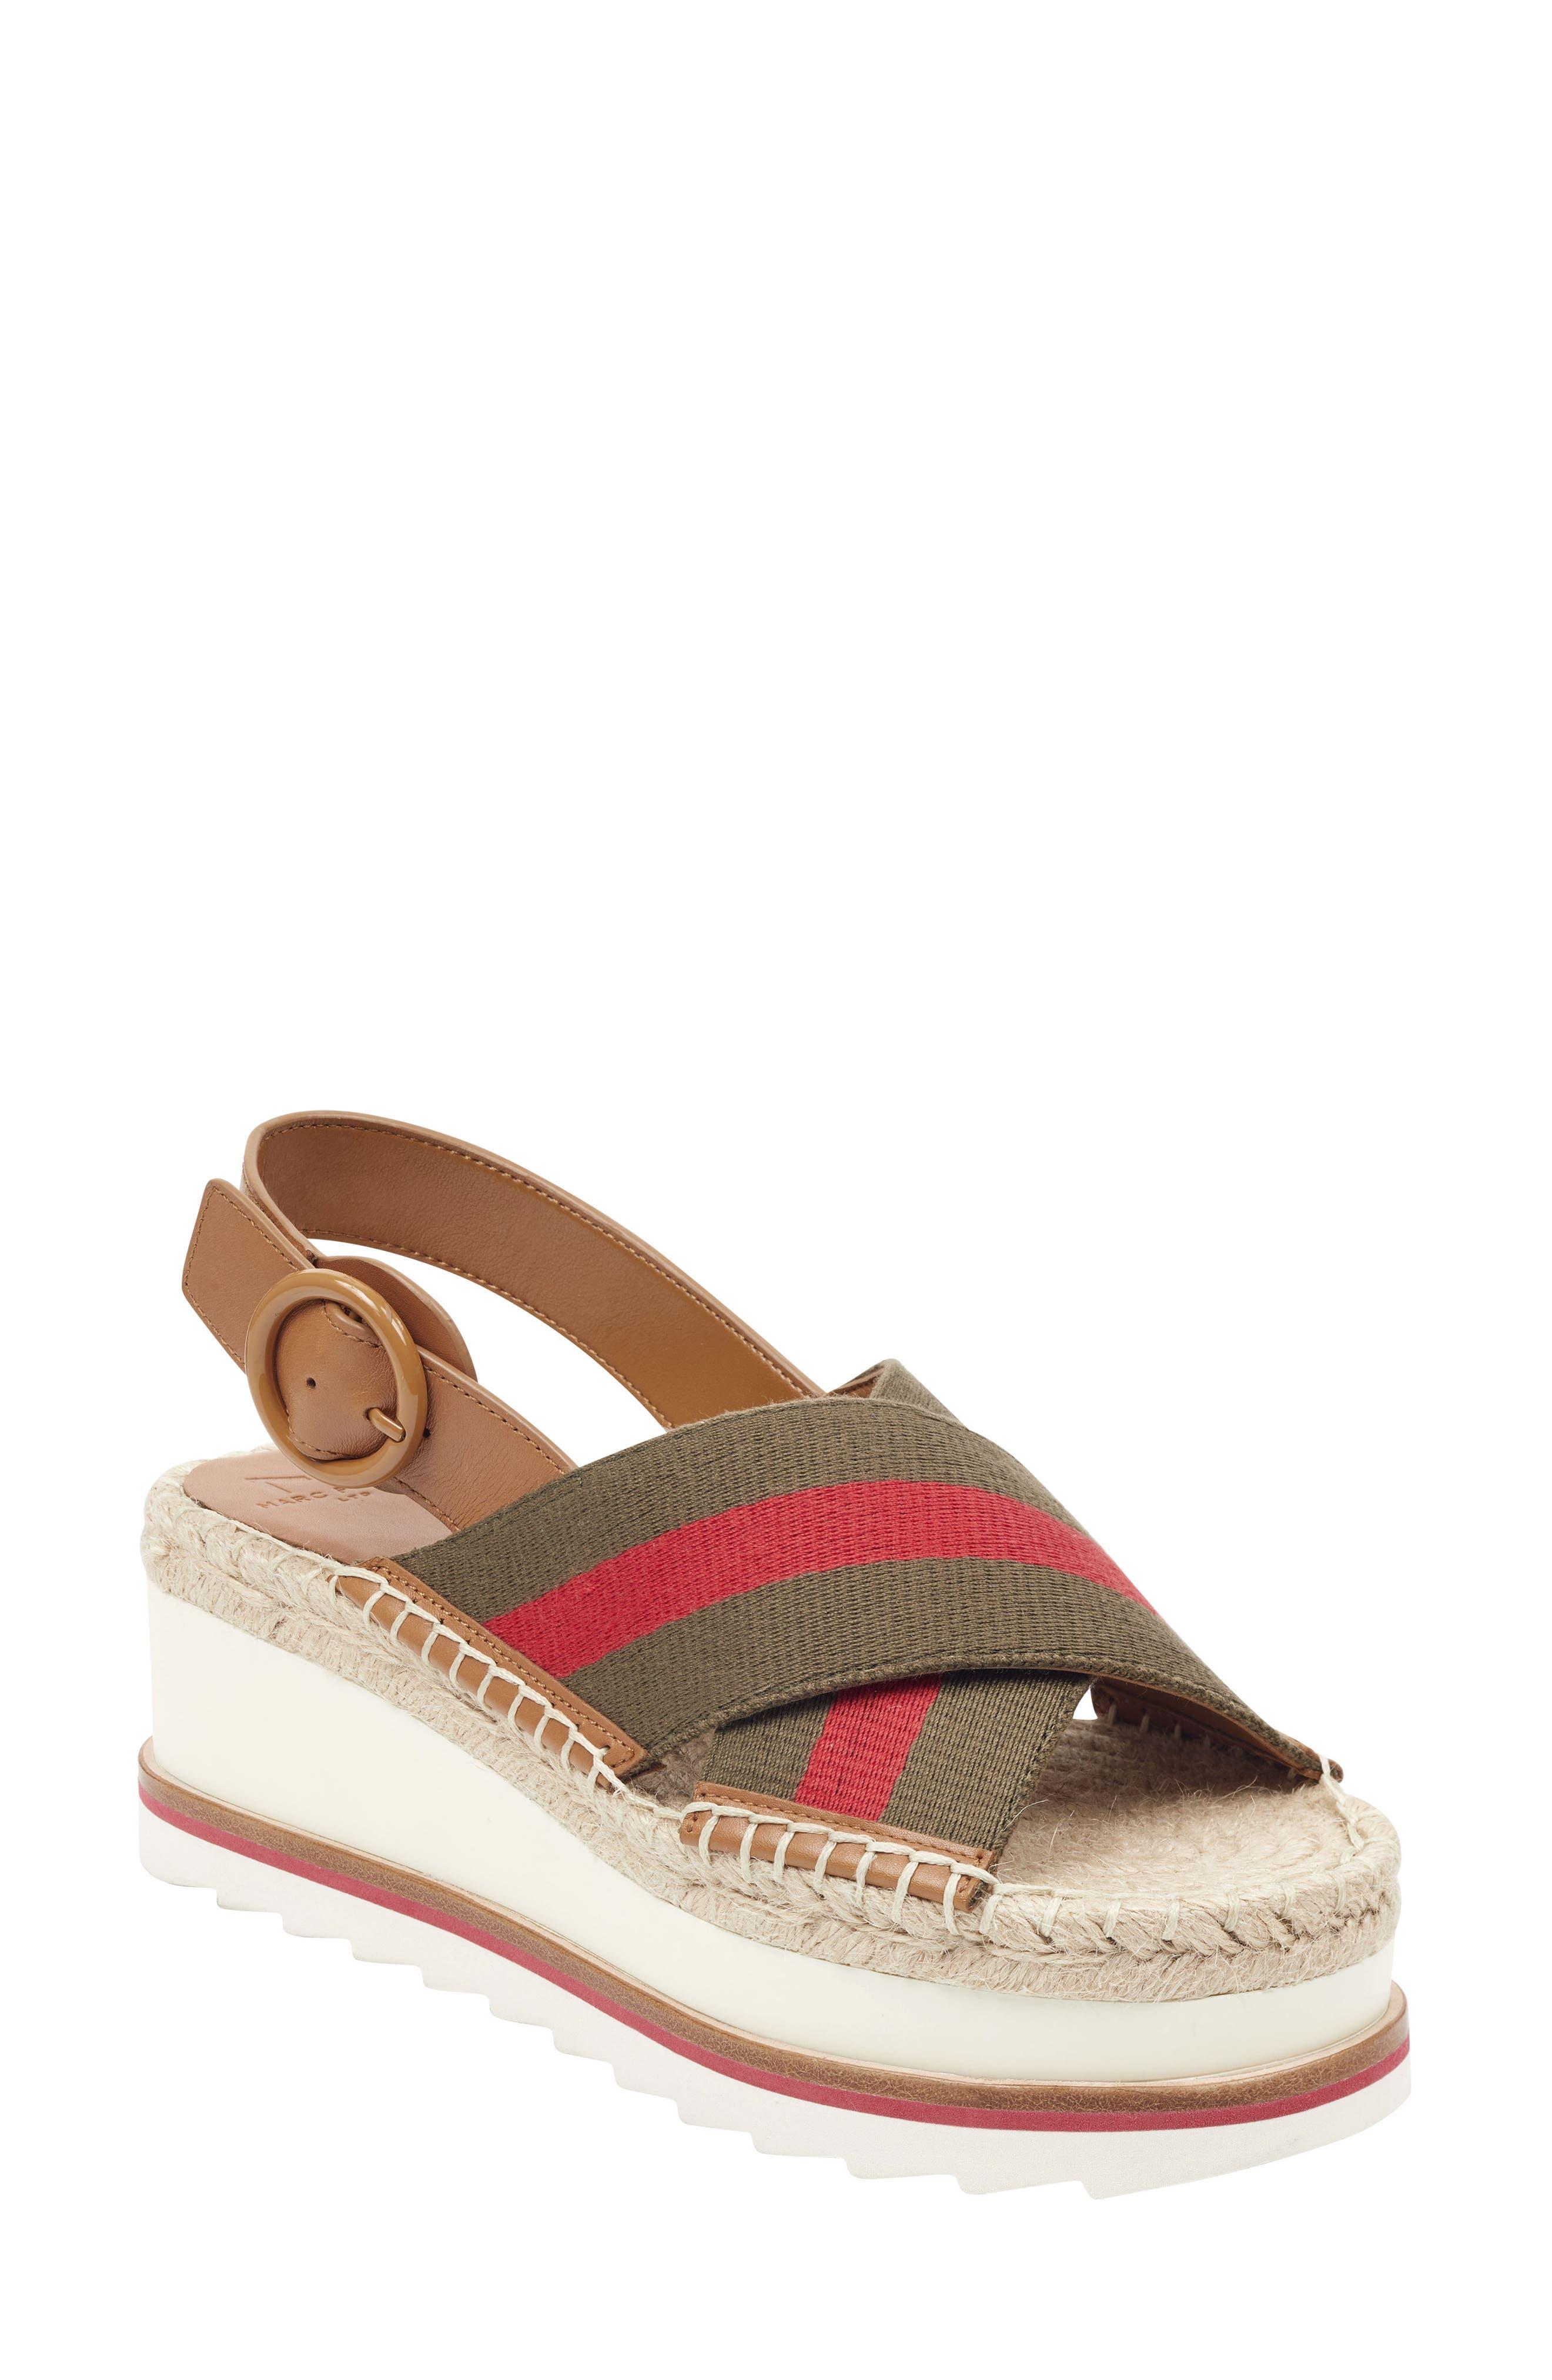 Marc Fisher Ltd Glenna Platform Slingback Sandal, Green